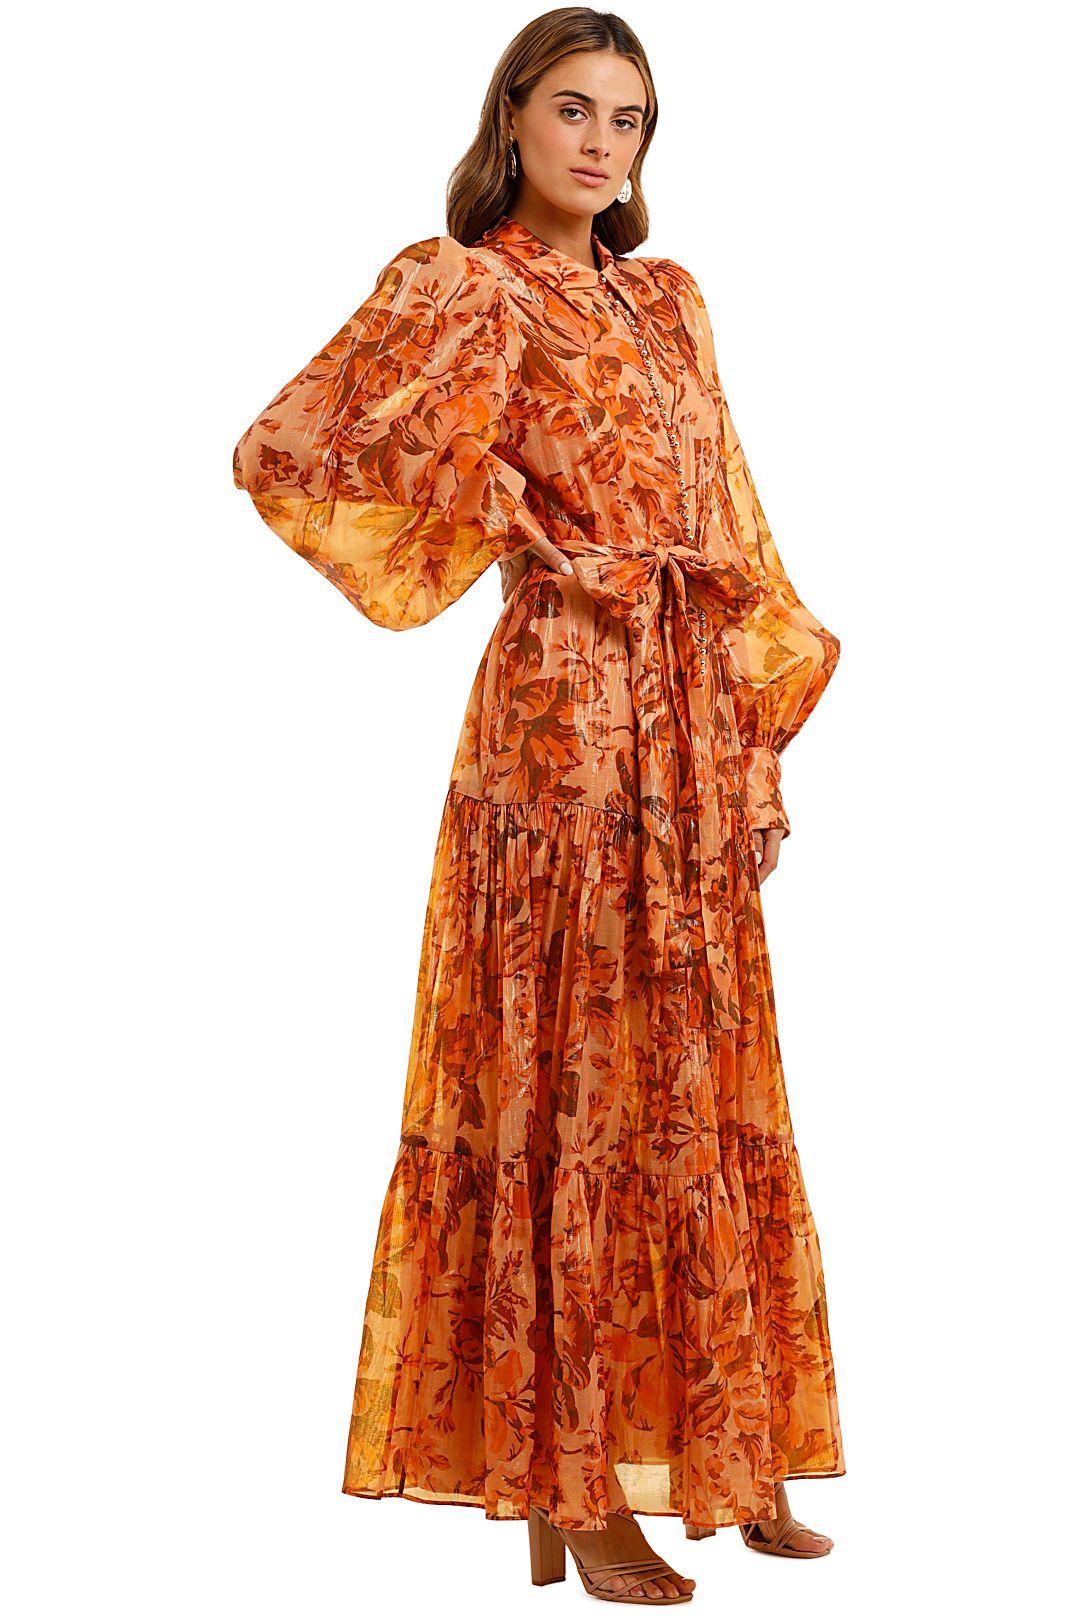 Acler Naples Dress Maxi Length